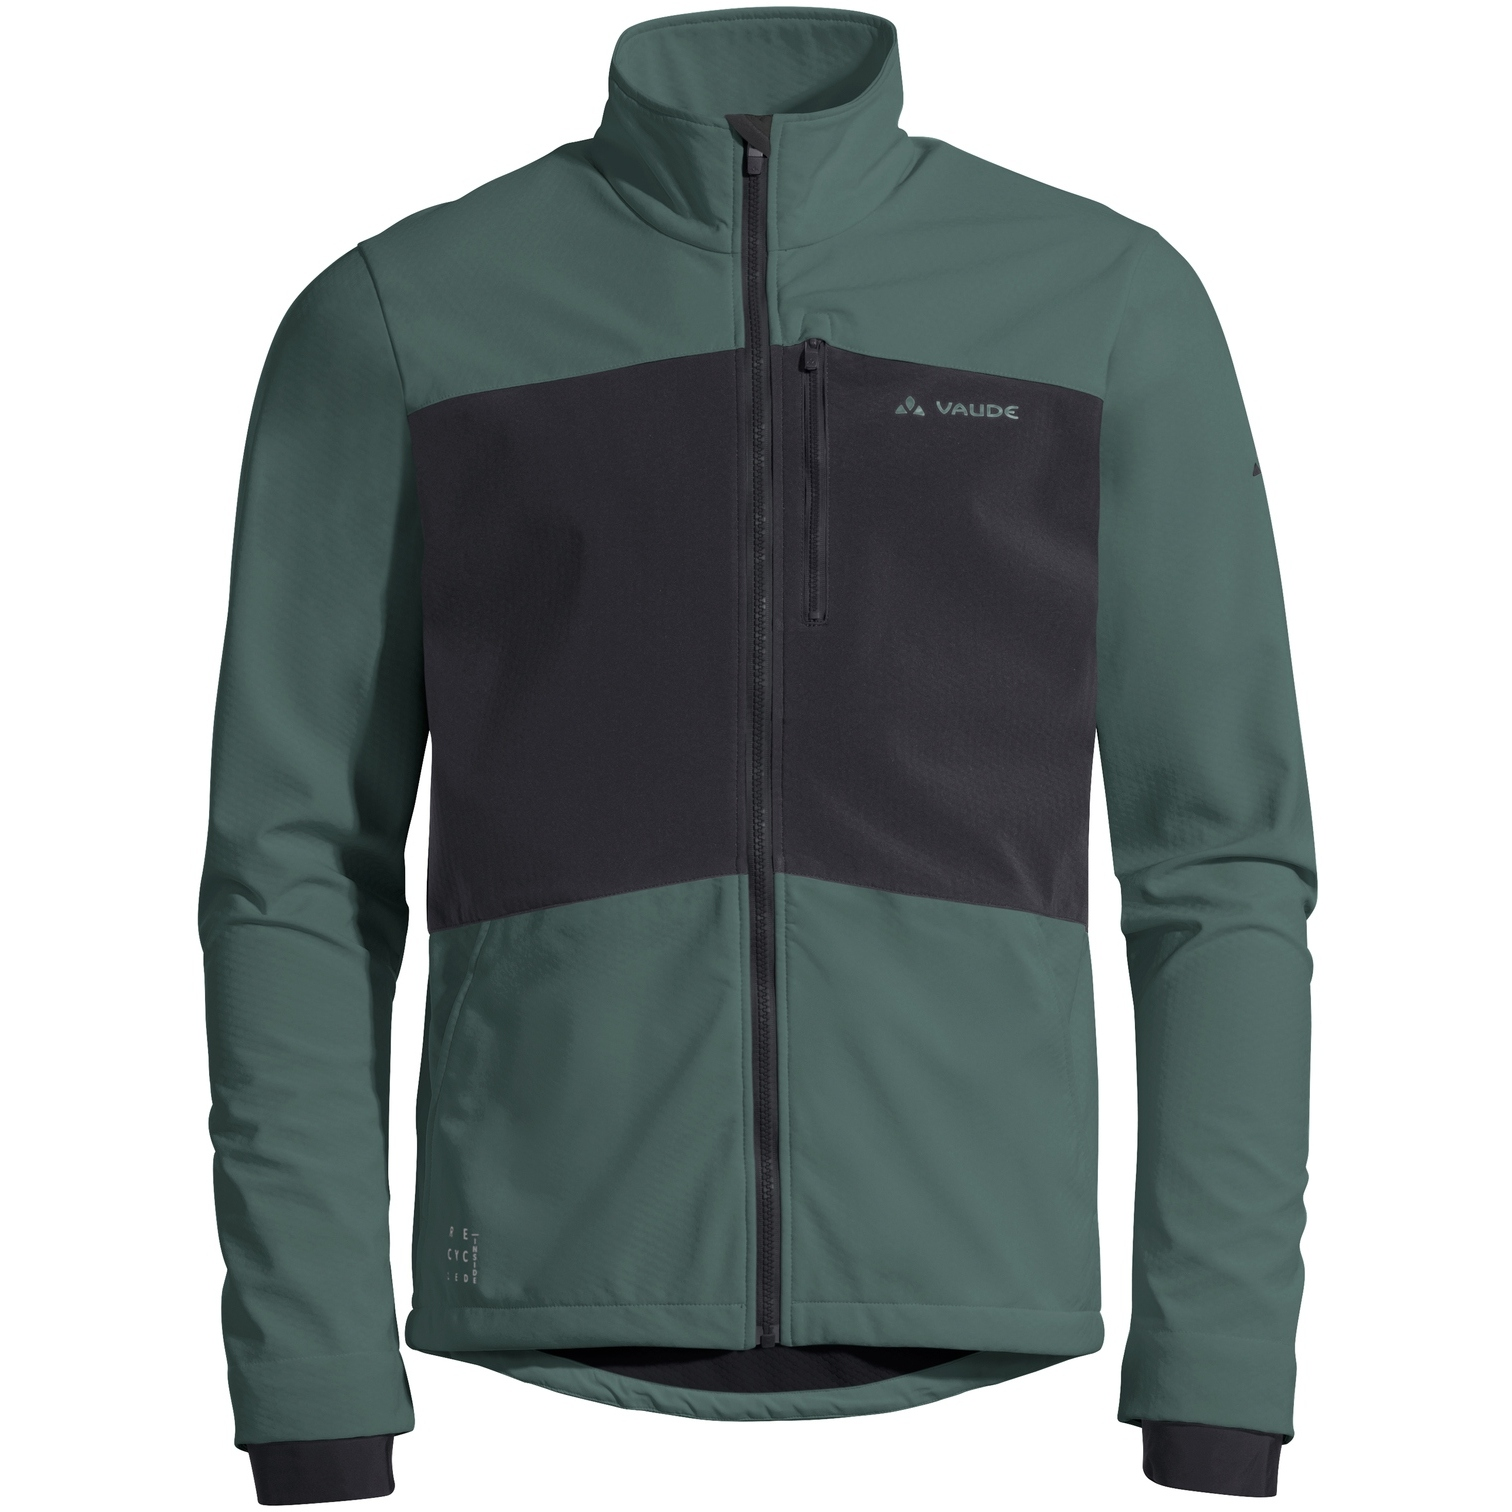 Vaude Men's Virt Softshell Jacket II - dusty forest